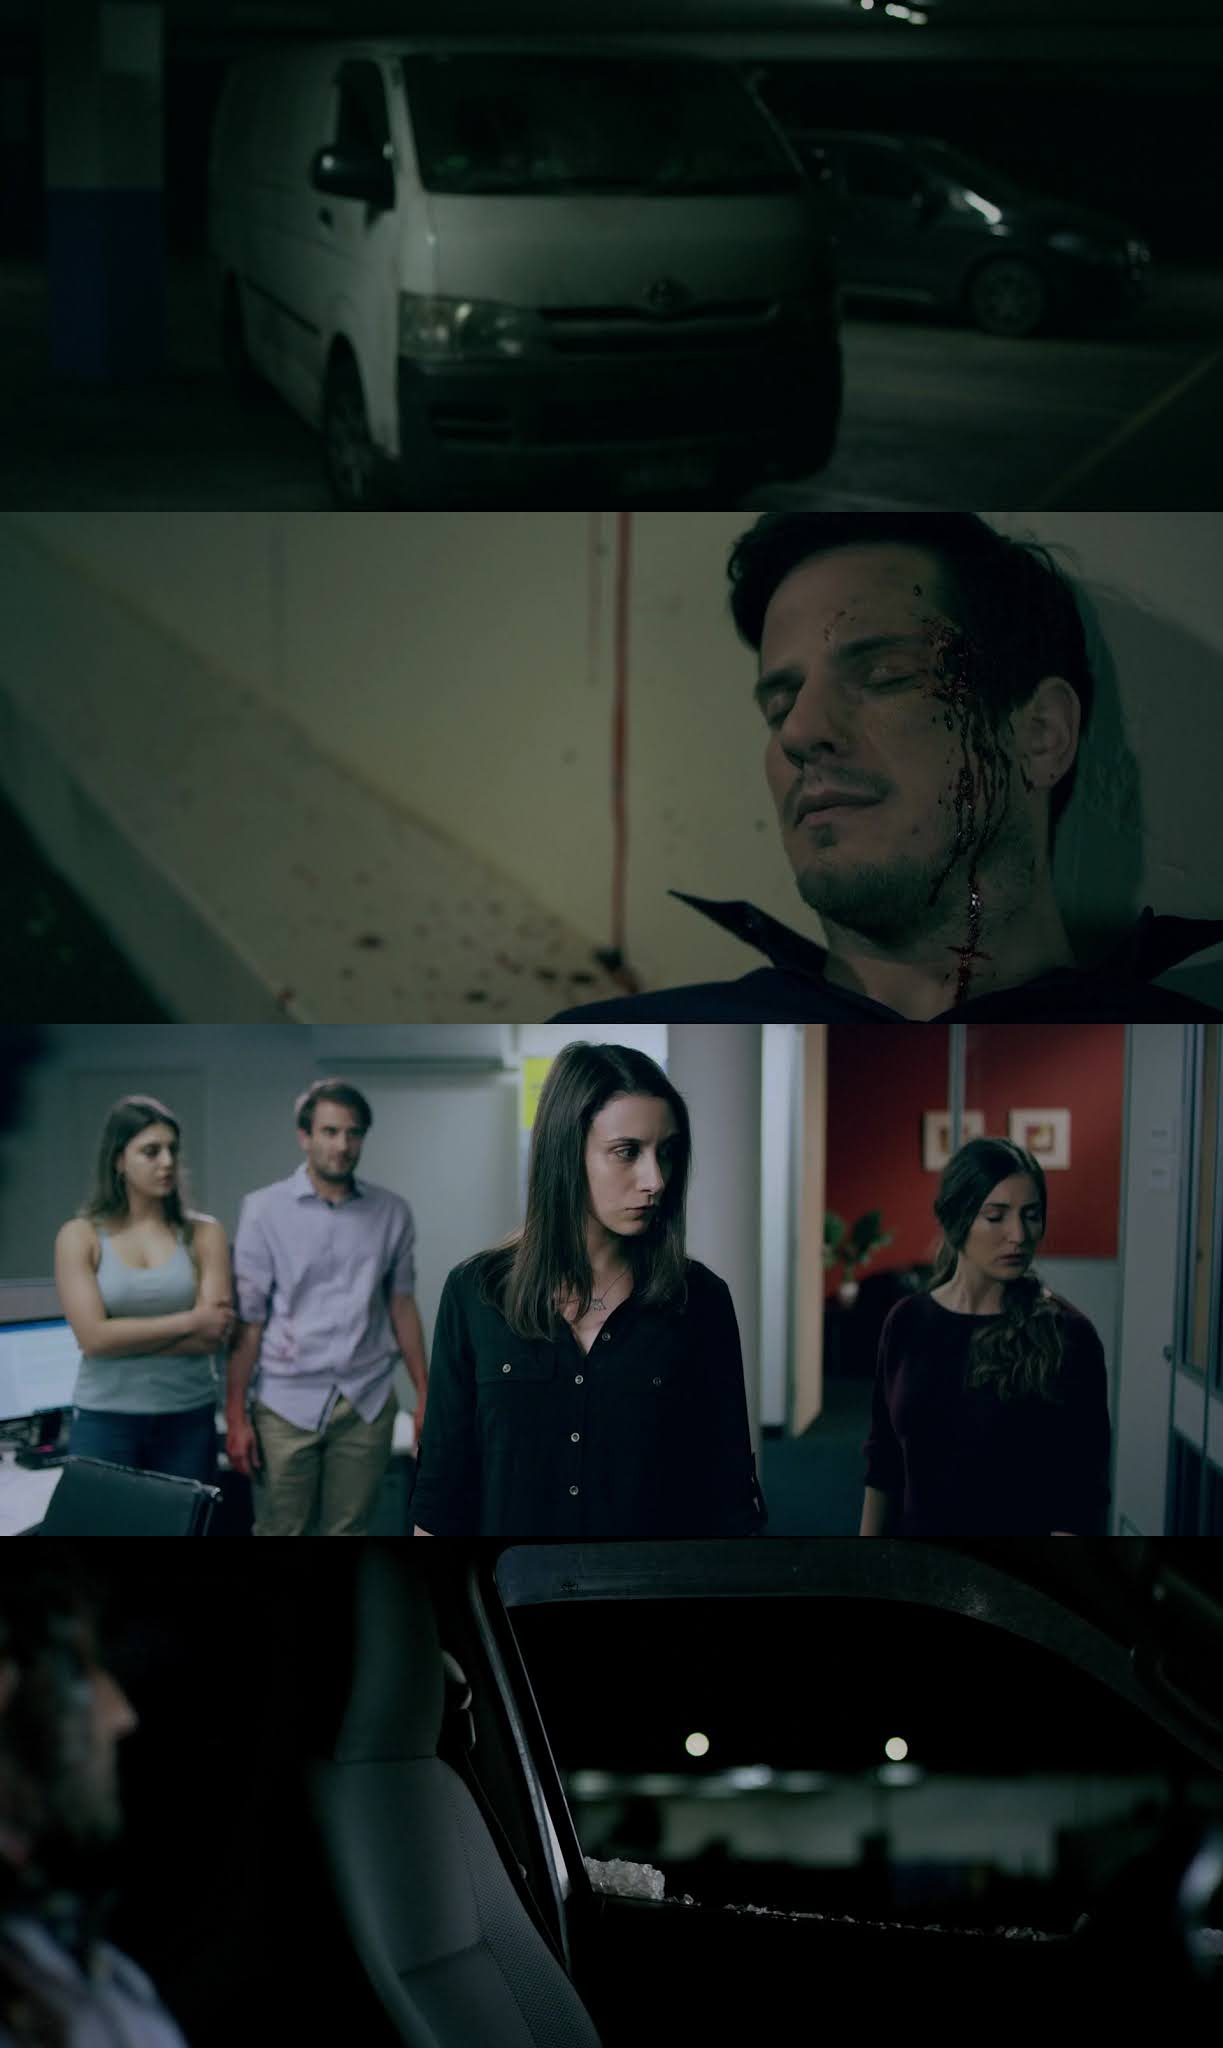 La Pandilla Una Noche de Terror 2020 HD 1080p Latino